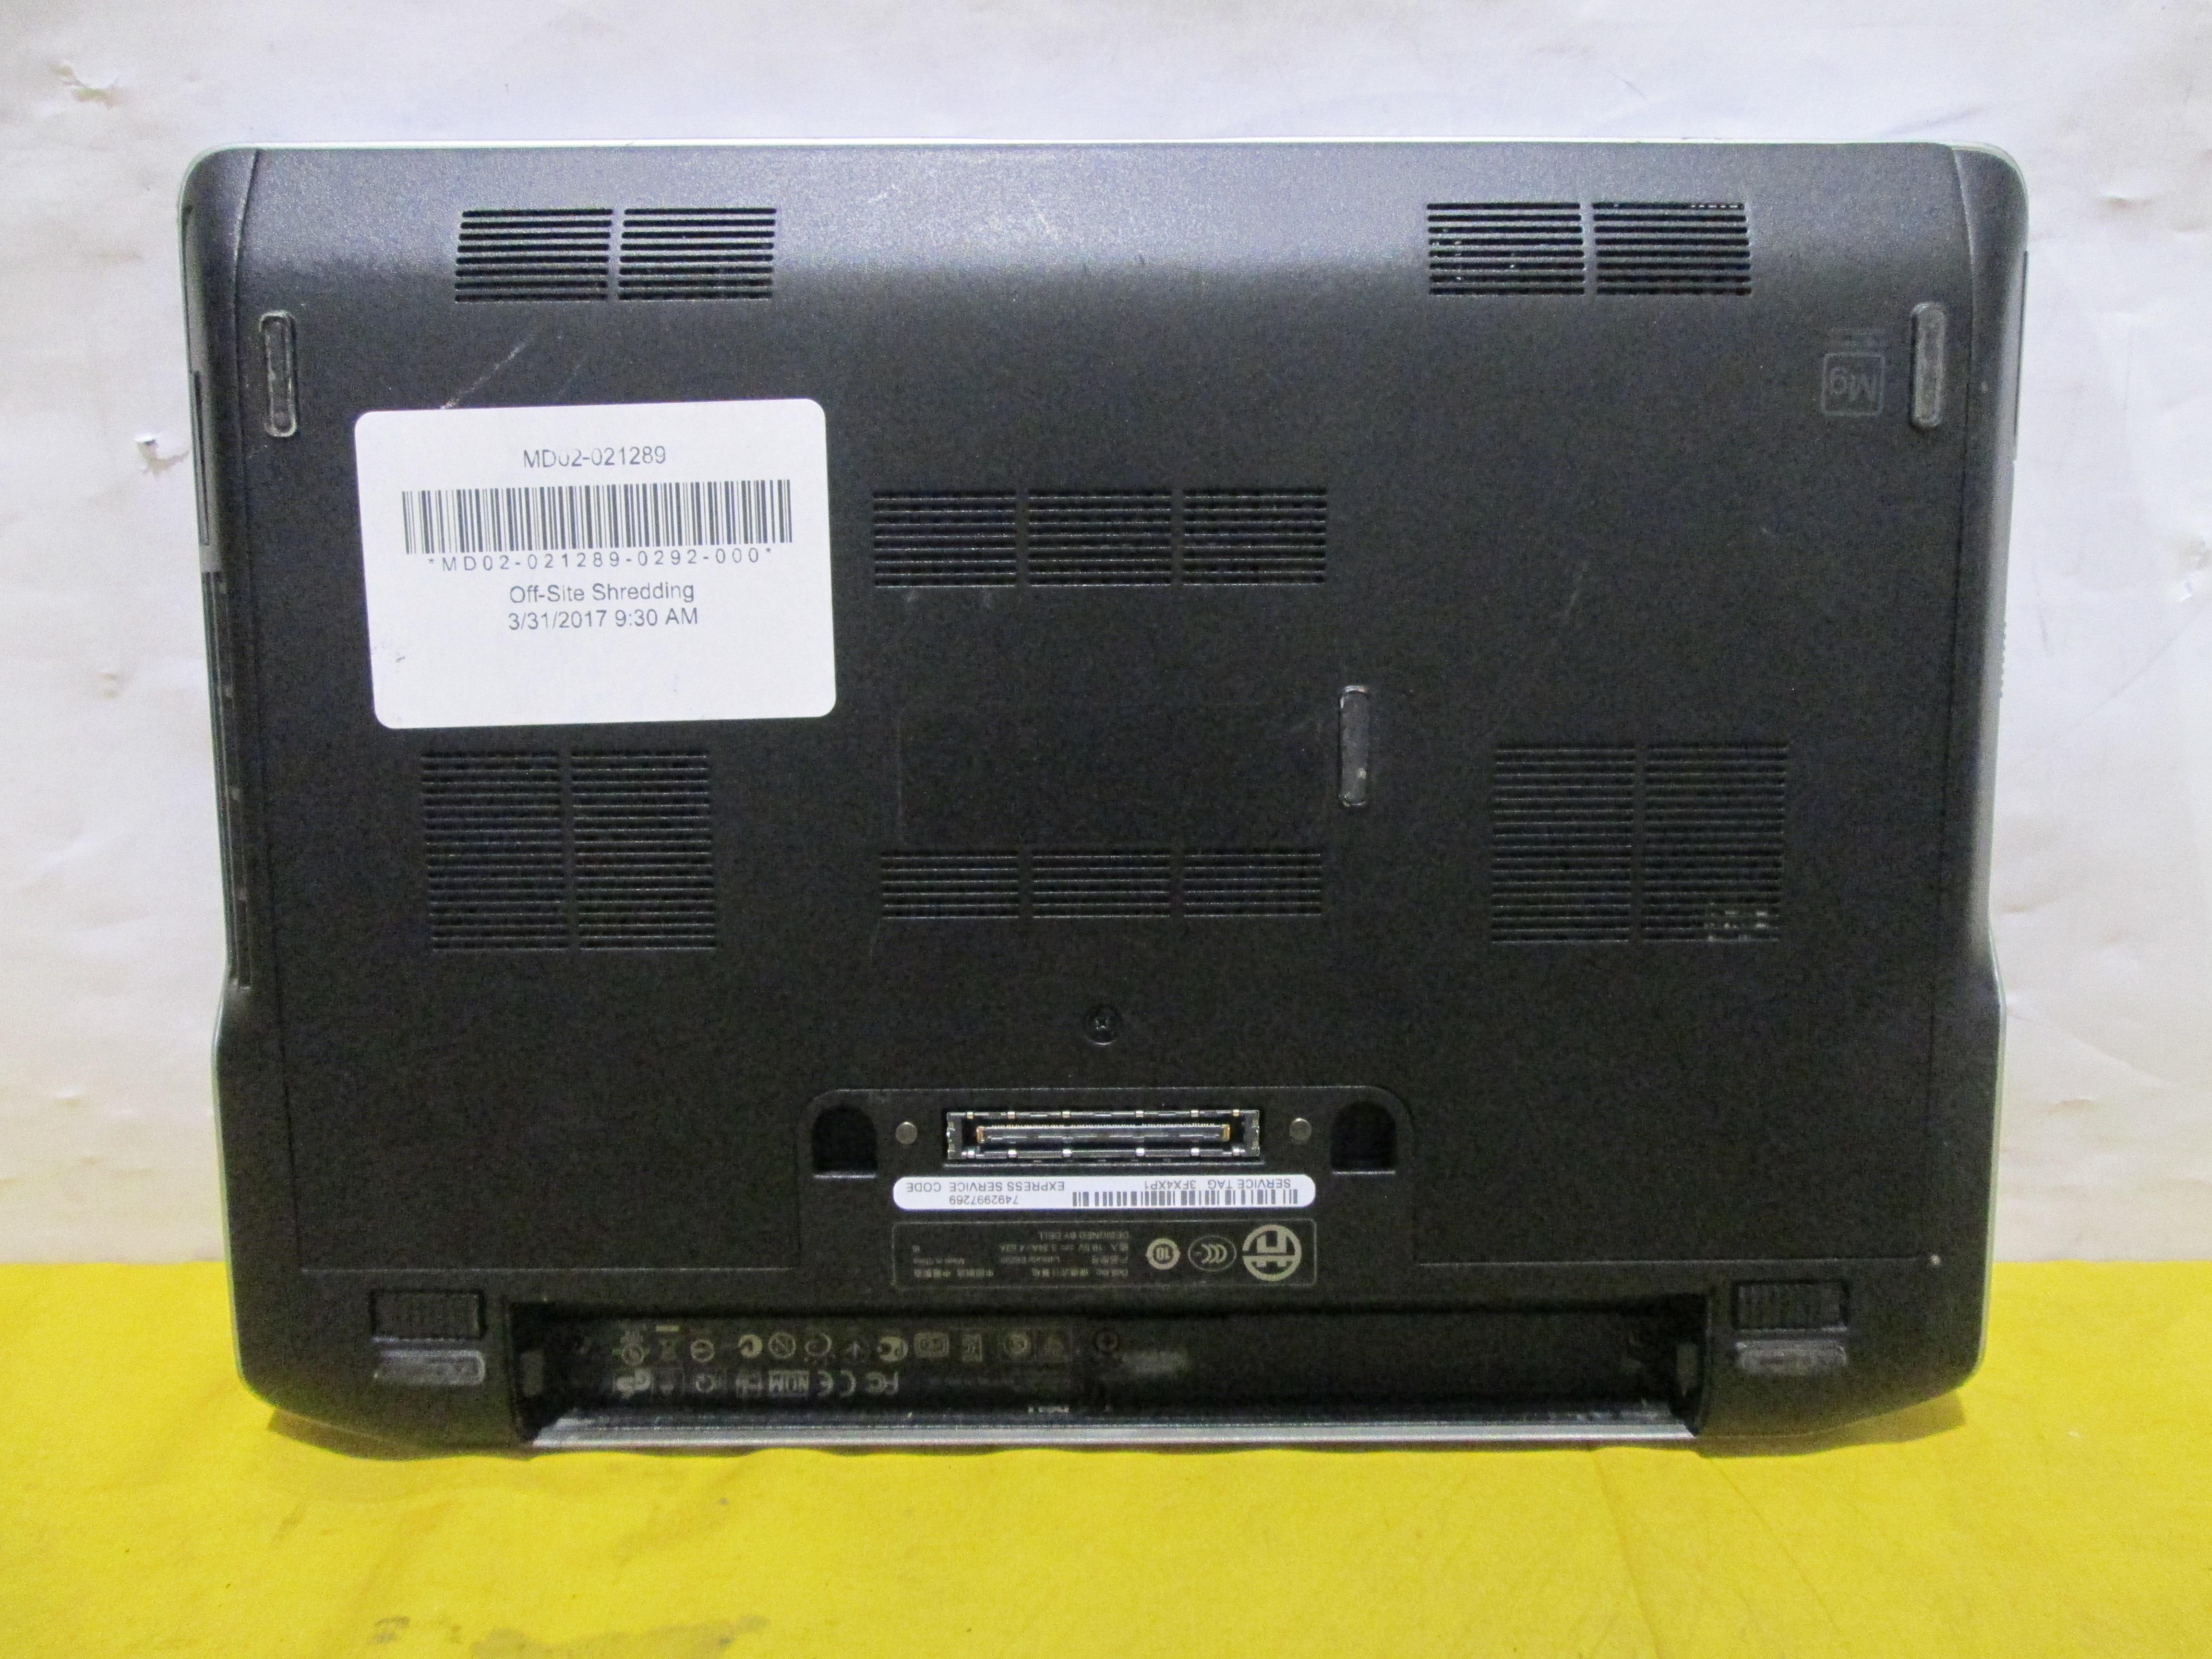 Dell-Latitude-E6220-Intel-Core-i7-2-70GHz-8G-Ram-Laptop-Integrated-Graphics thumbnail 5